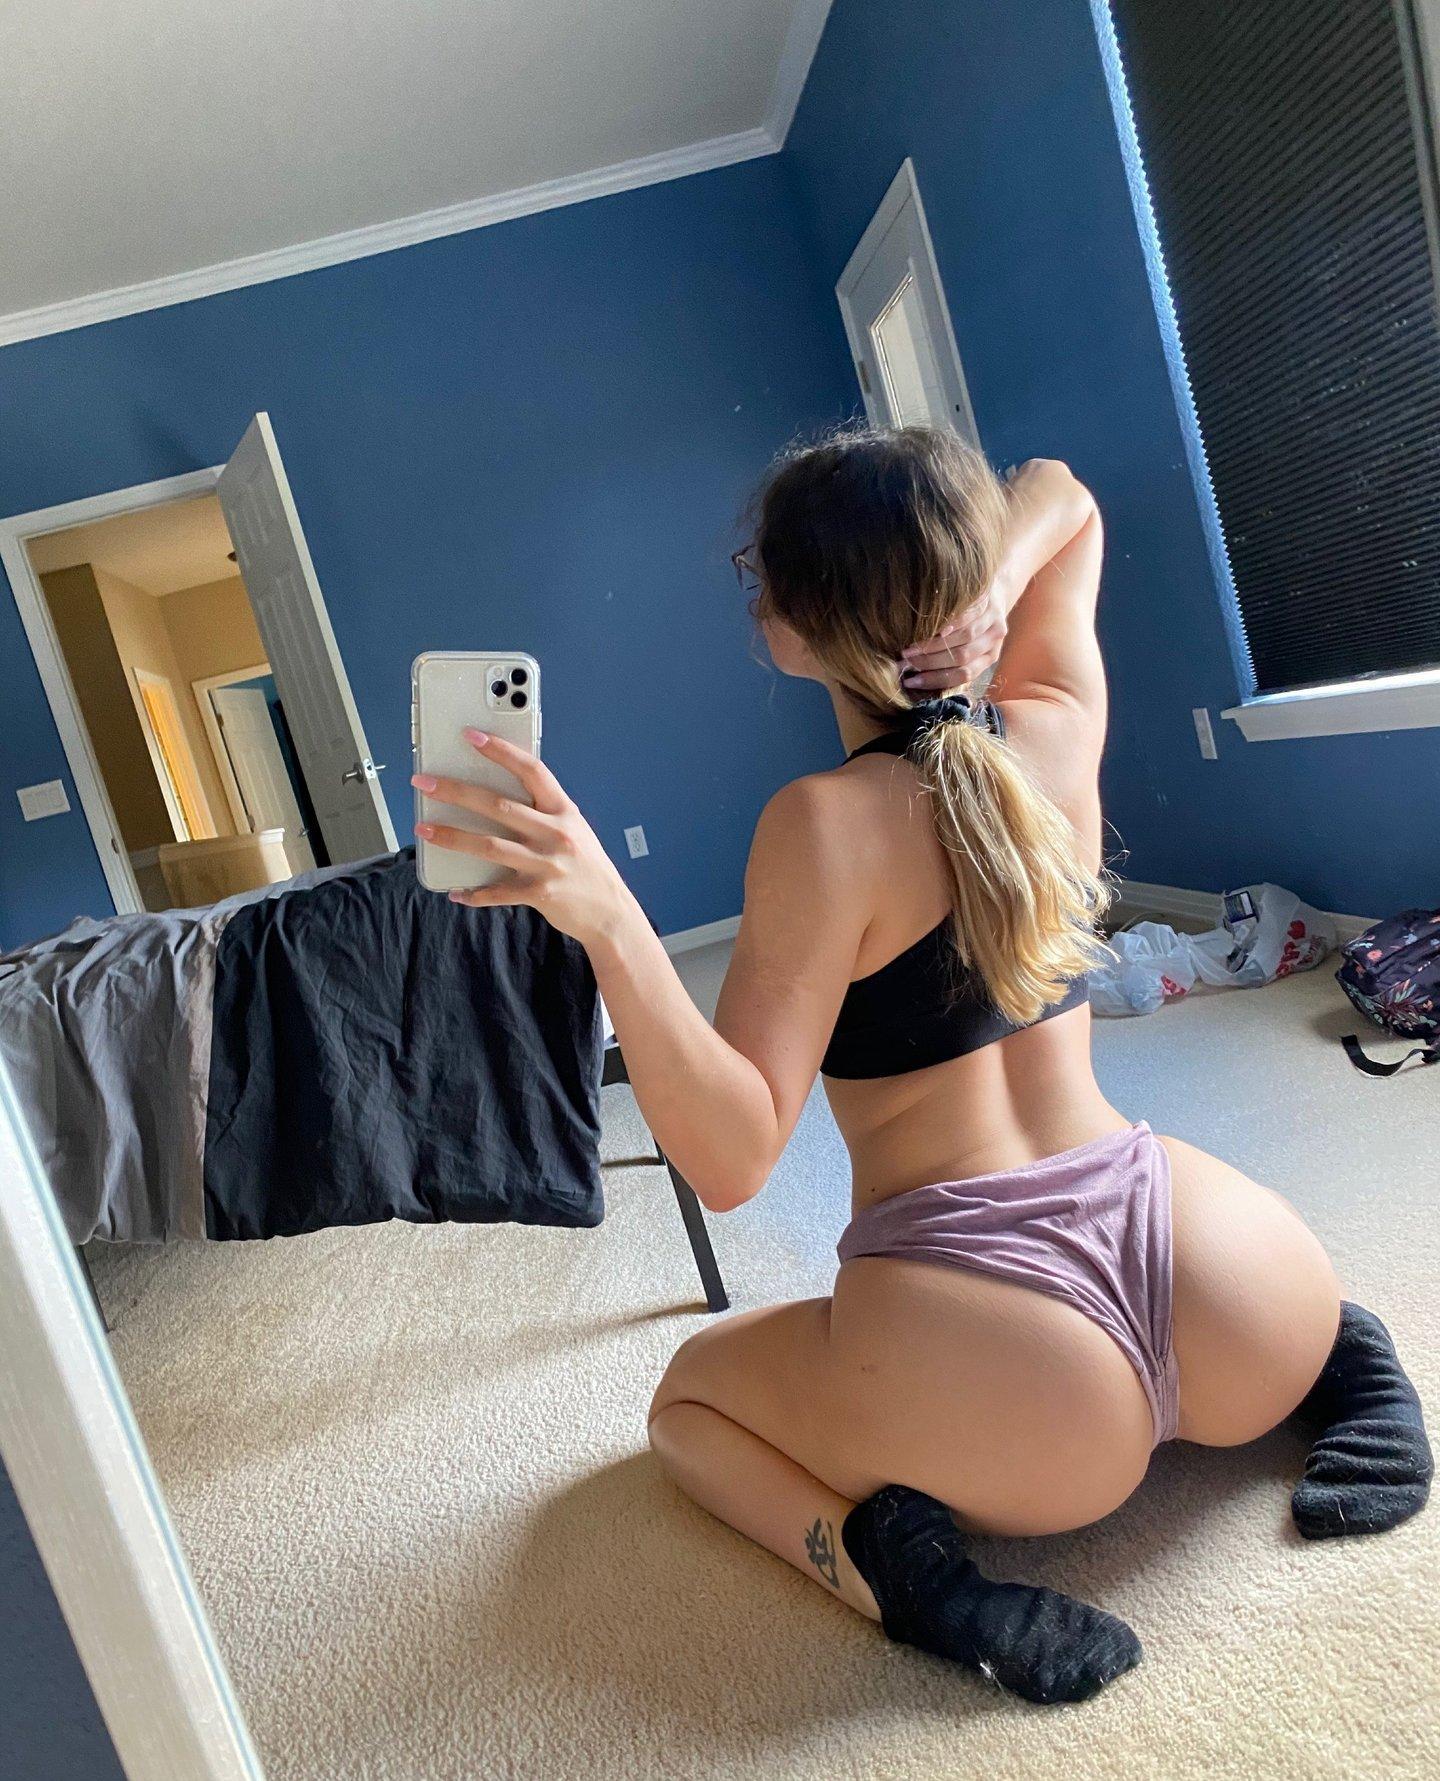 Alliecatt Alliecattxoxo Onlyfans Nude Leaks 0002